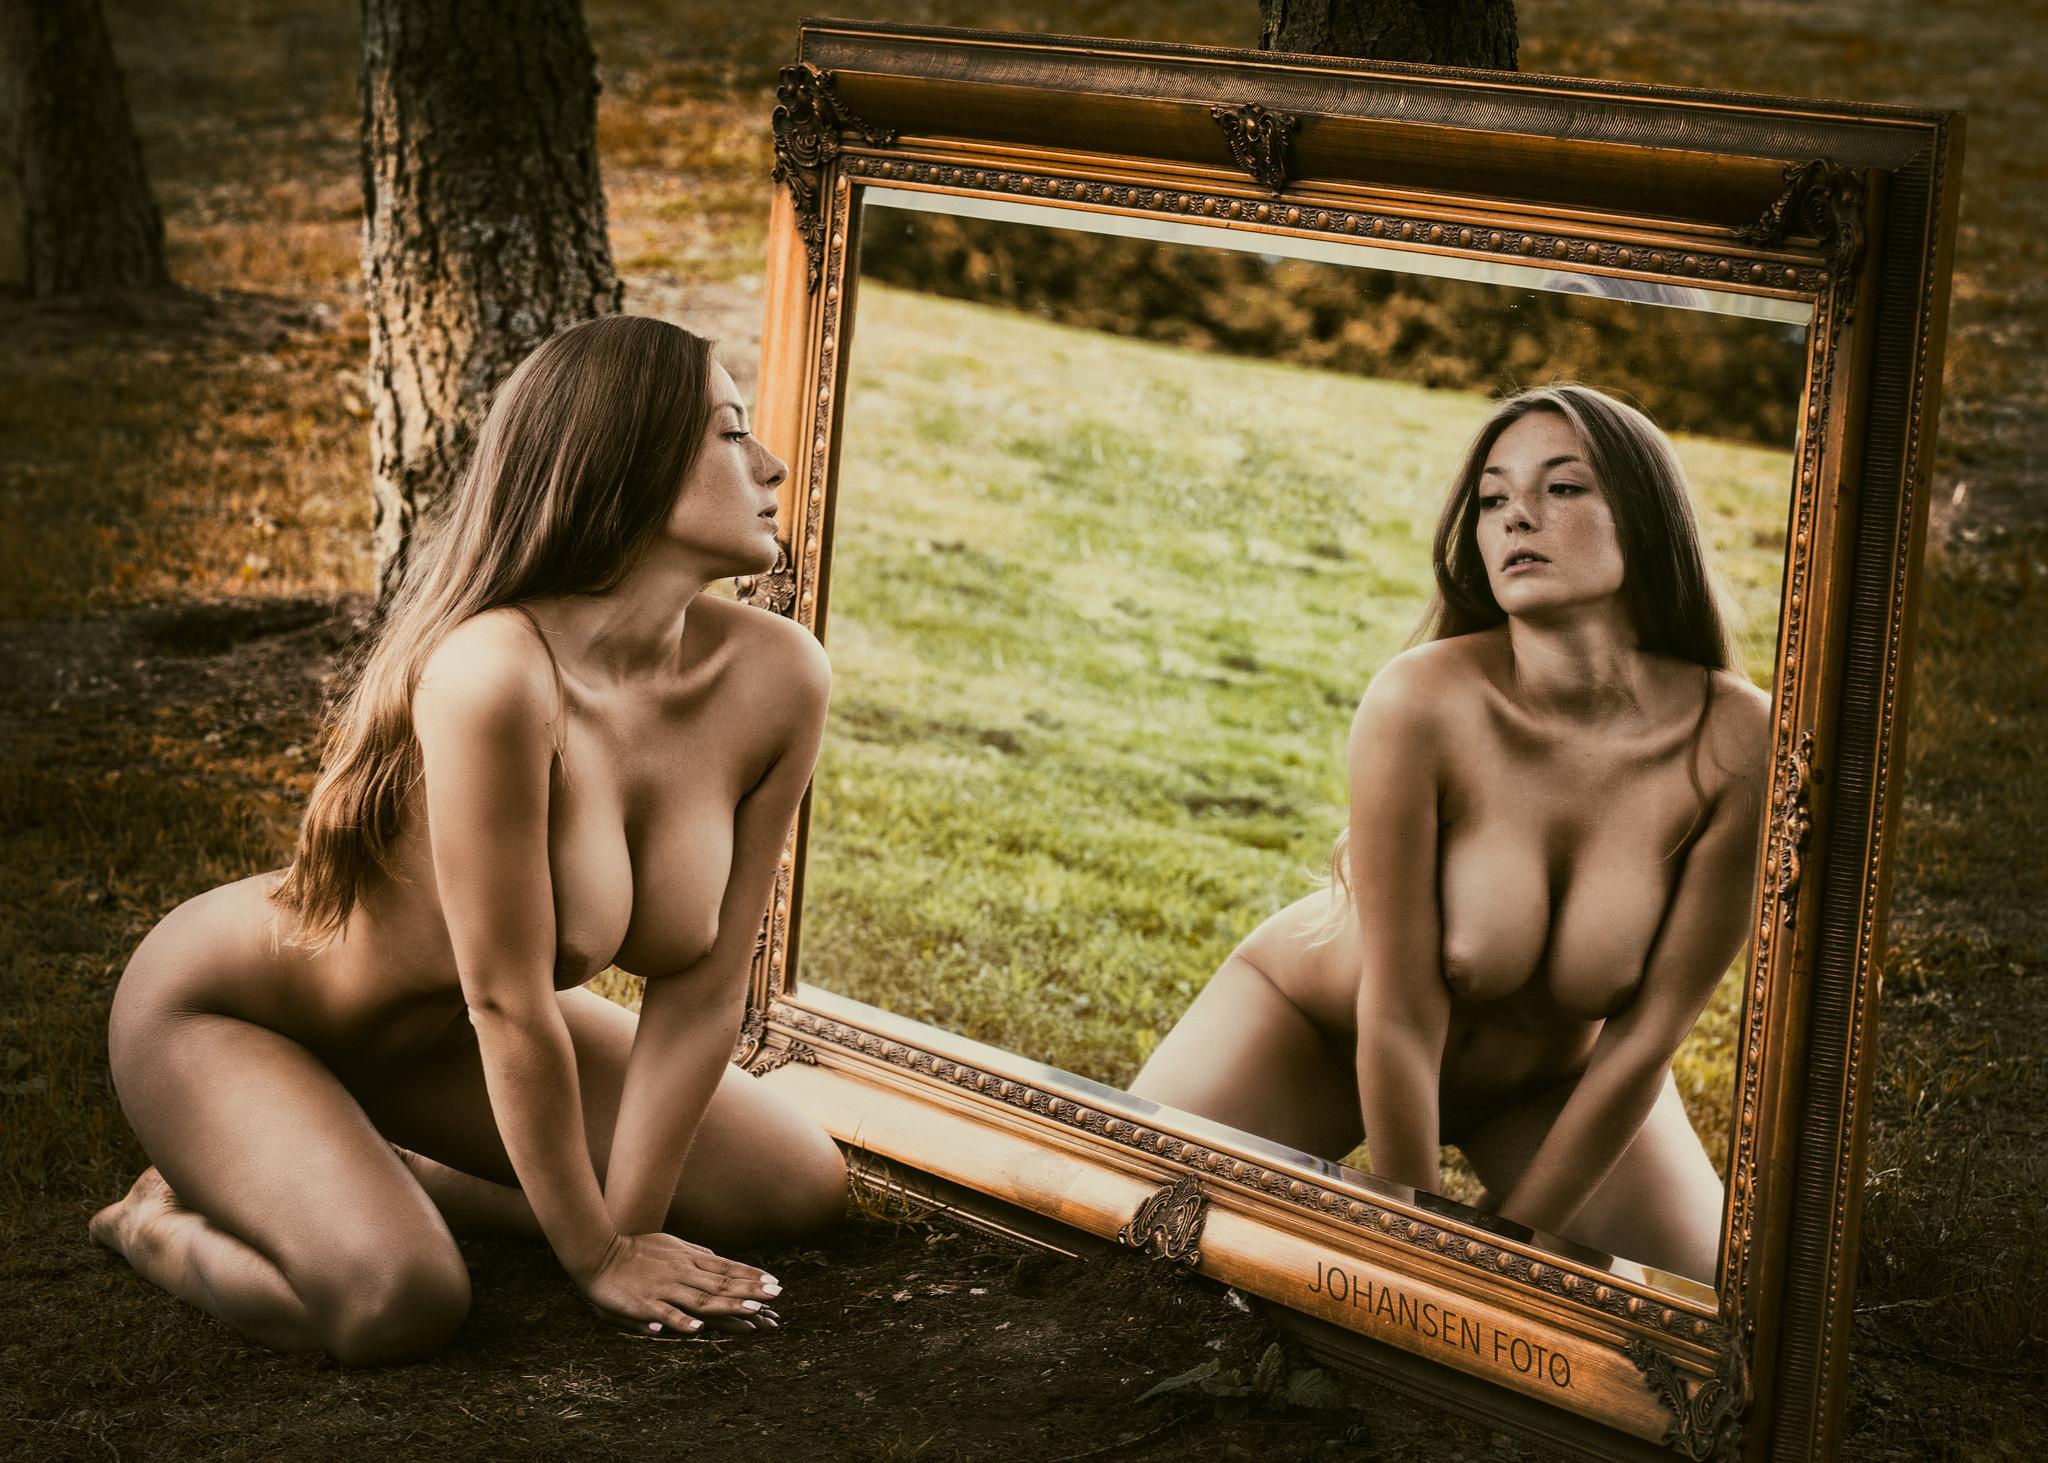 Leilene reality nudes